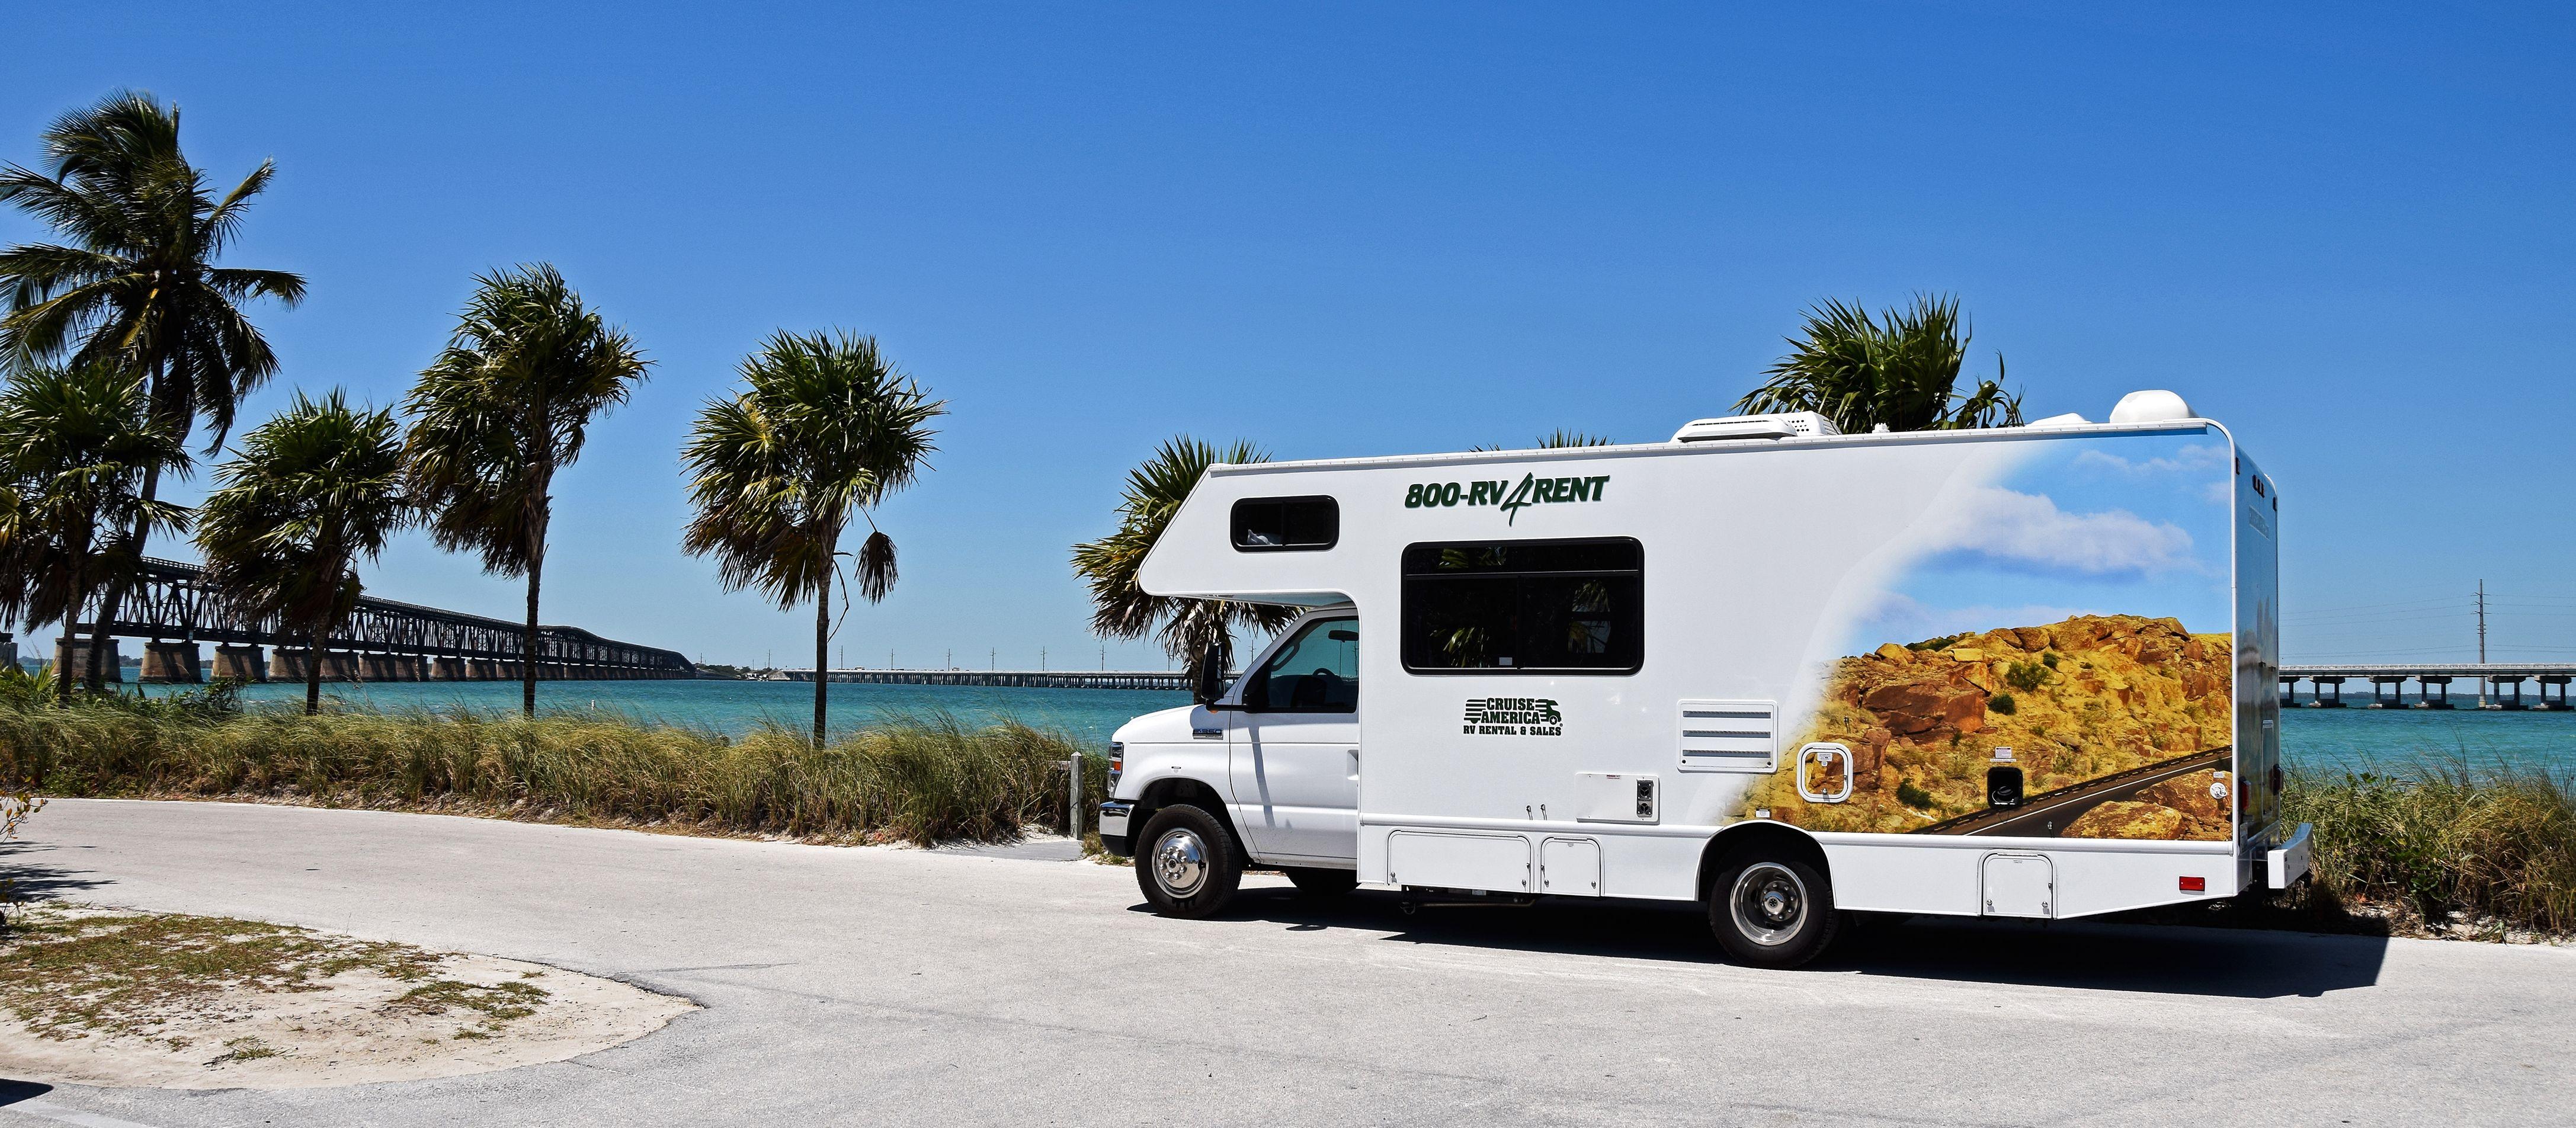 Das C25 Wohnmobil von Cruise America in Florida